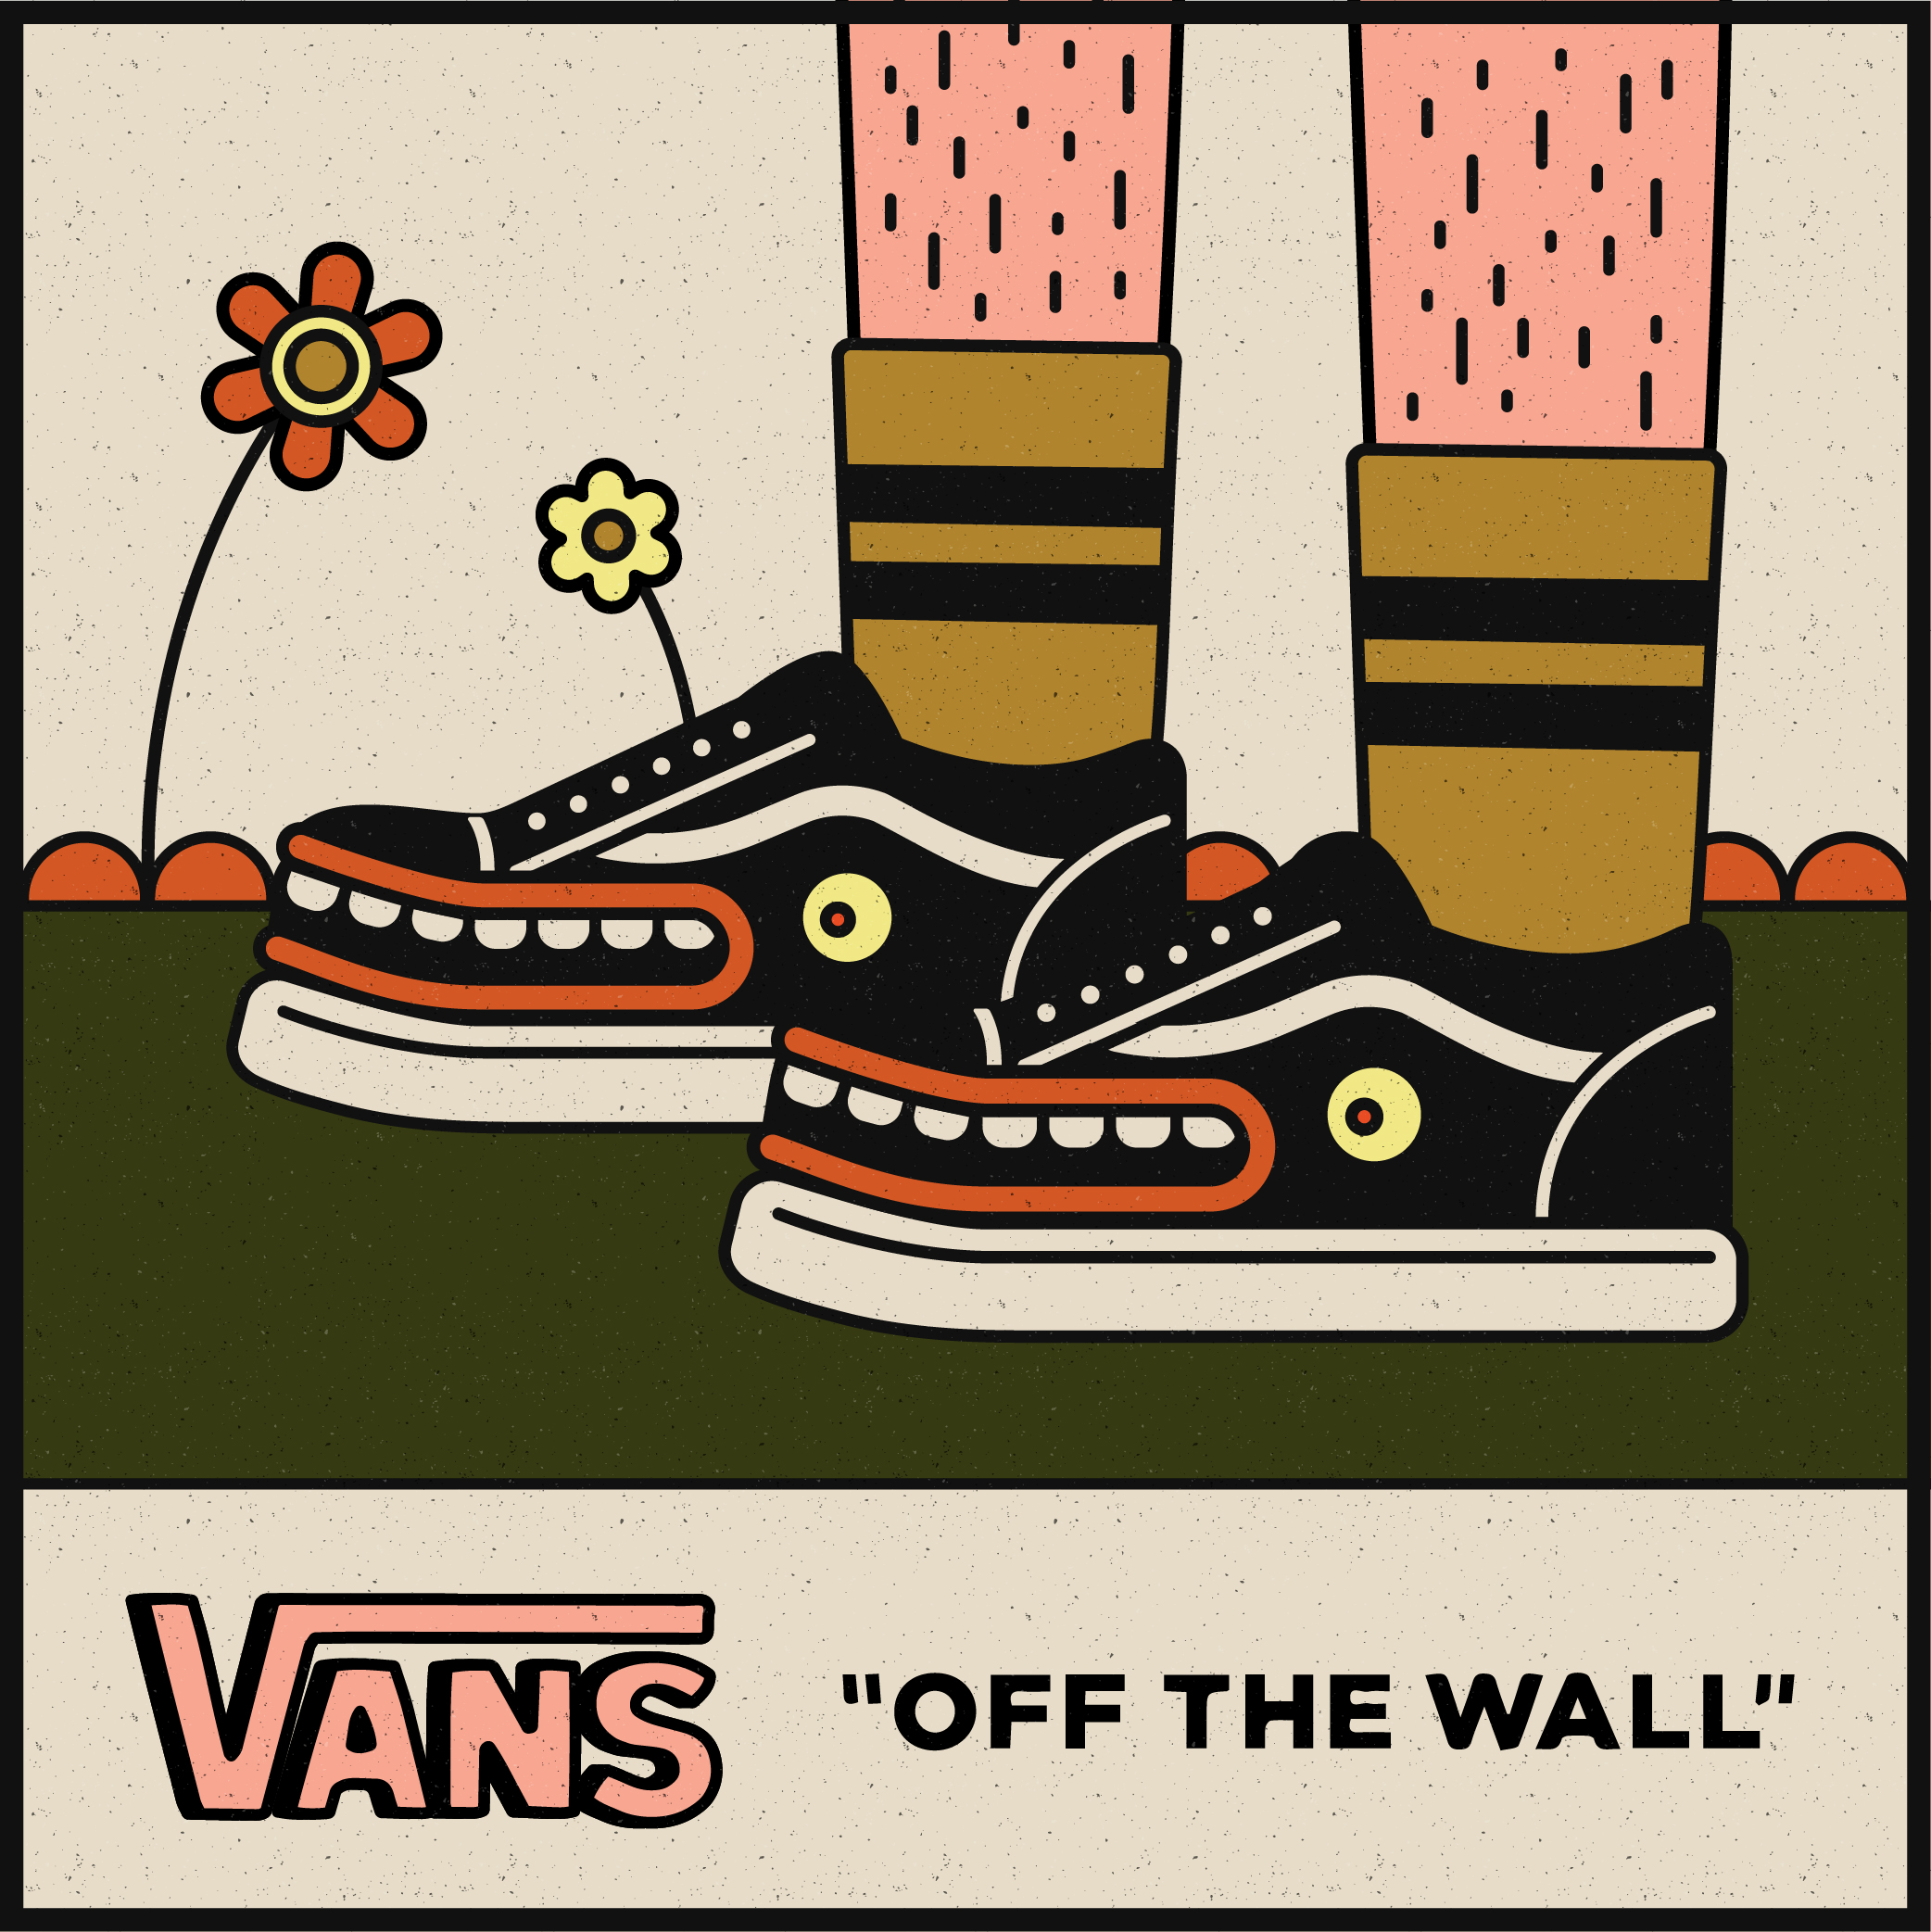 vans_since66_1.1-02.jpg